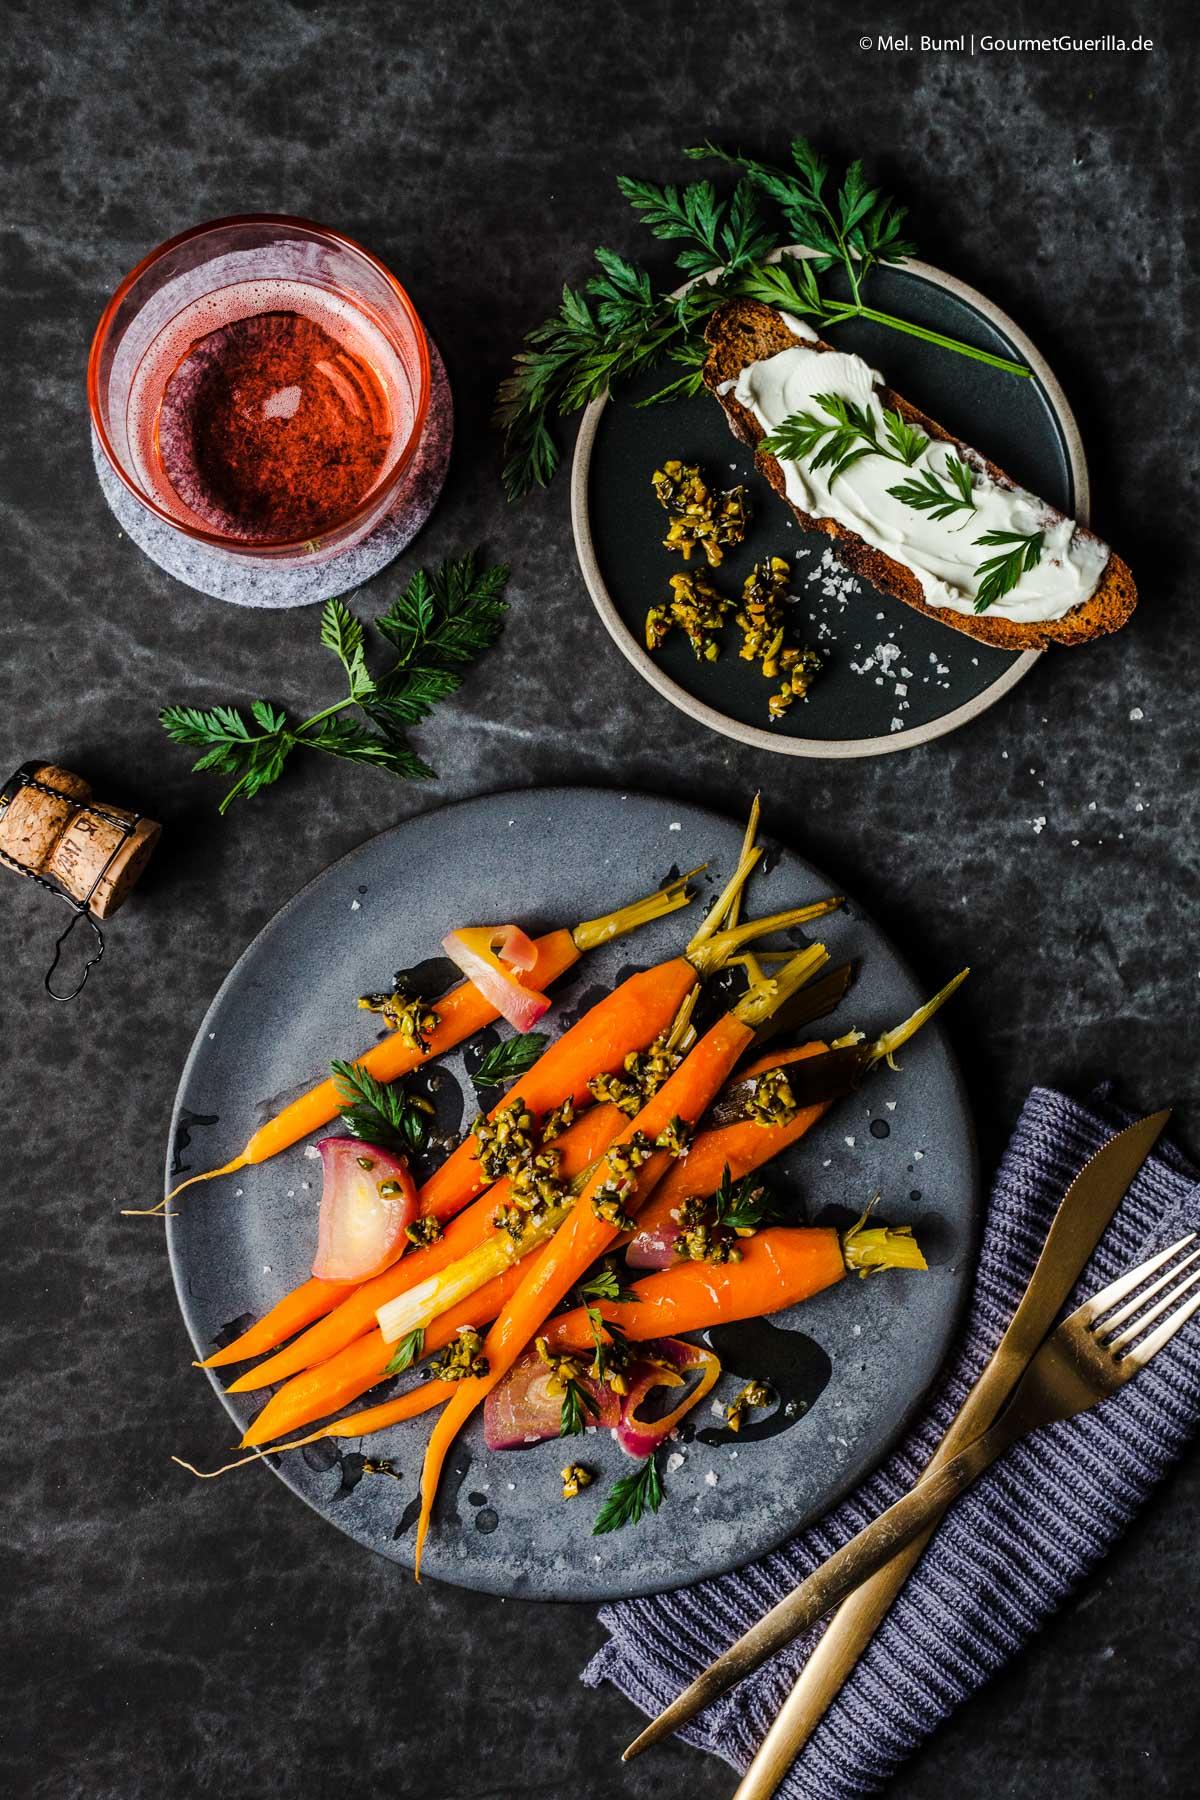 Orangen-Möhren mit Pistazien-Thymian-Crumble |GourmetGuerilla.de